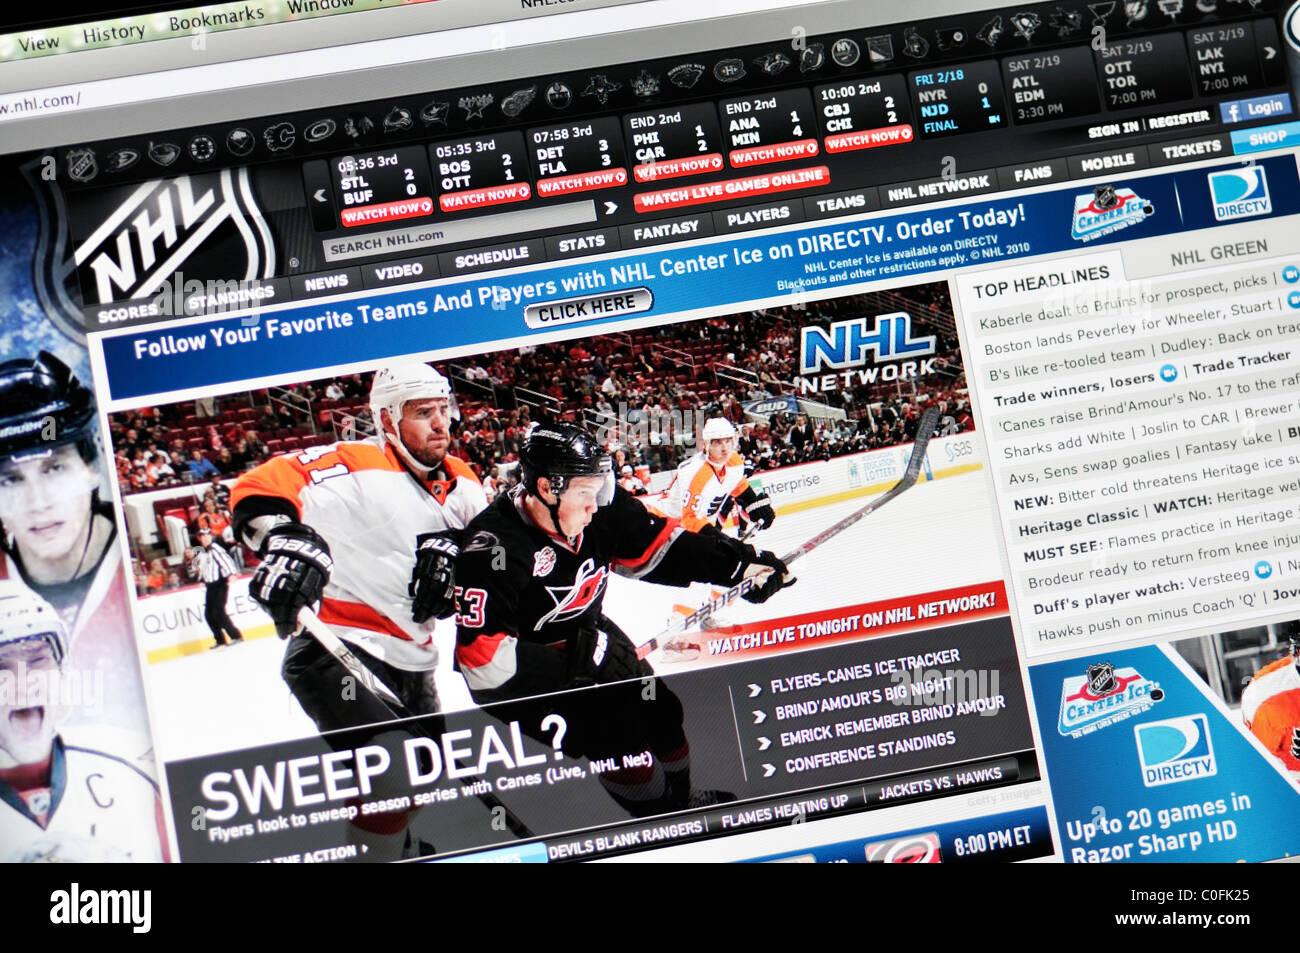 Nhl National Hockey League Stock Photos Nhl National Hockey League